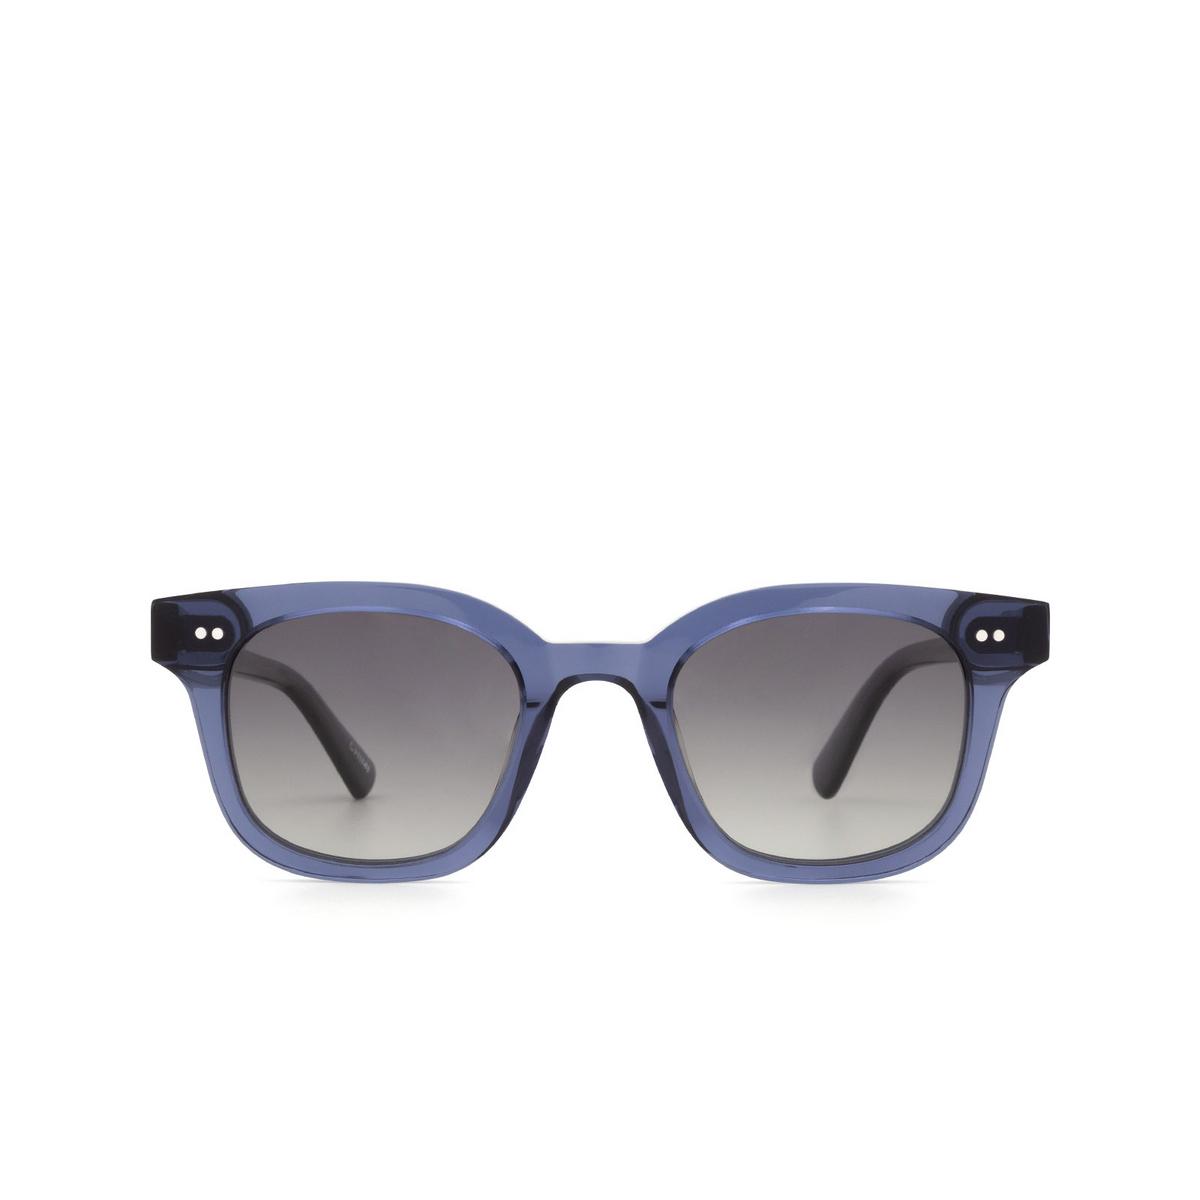 Chimi® Square Sunglasses: 02 color Blue - front view.